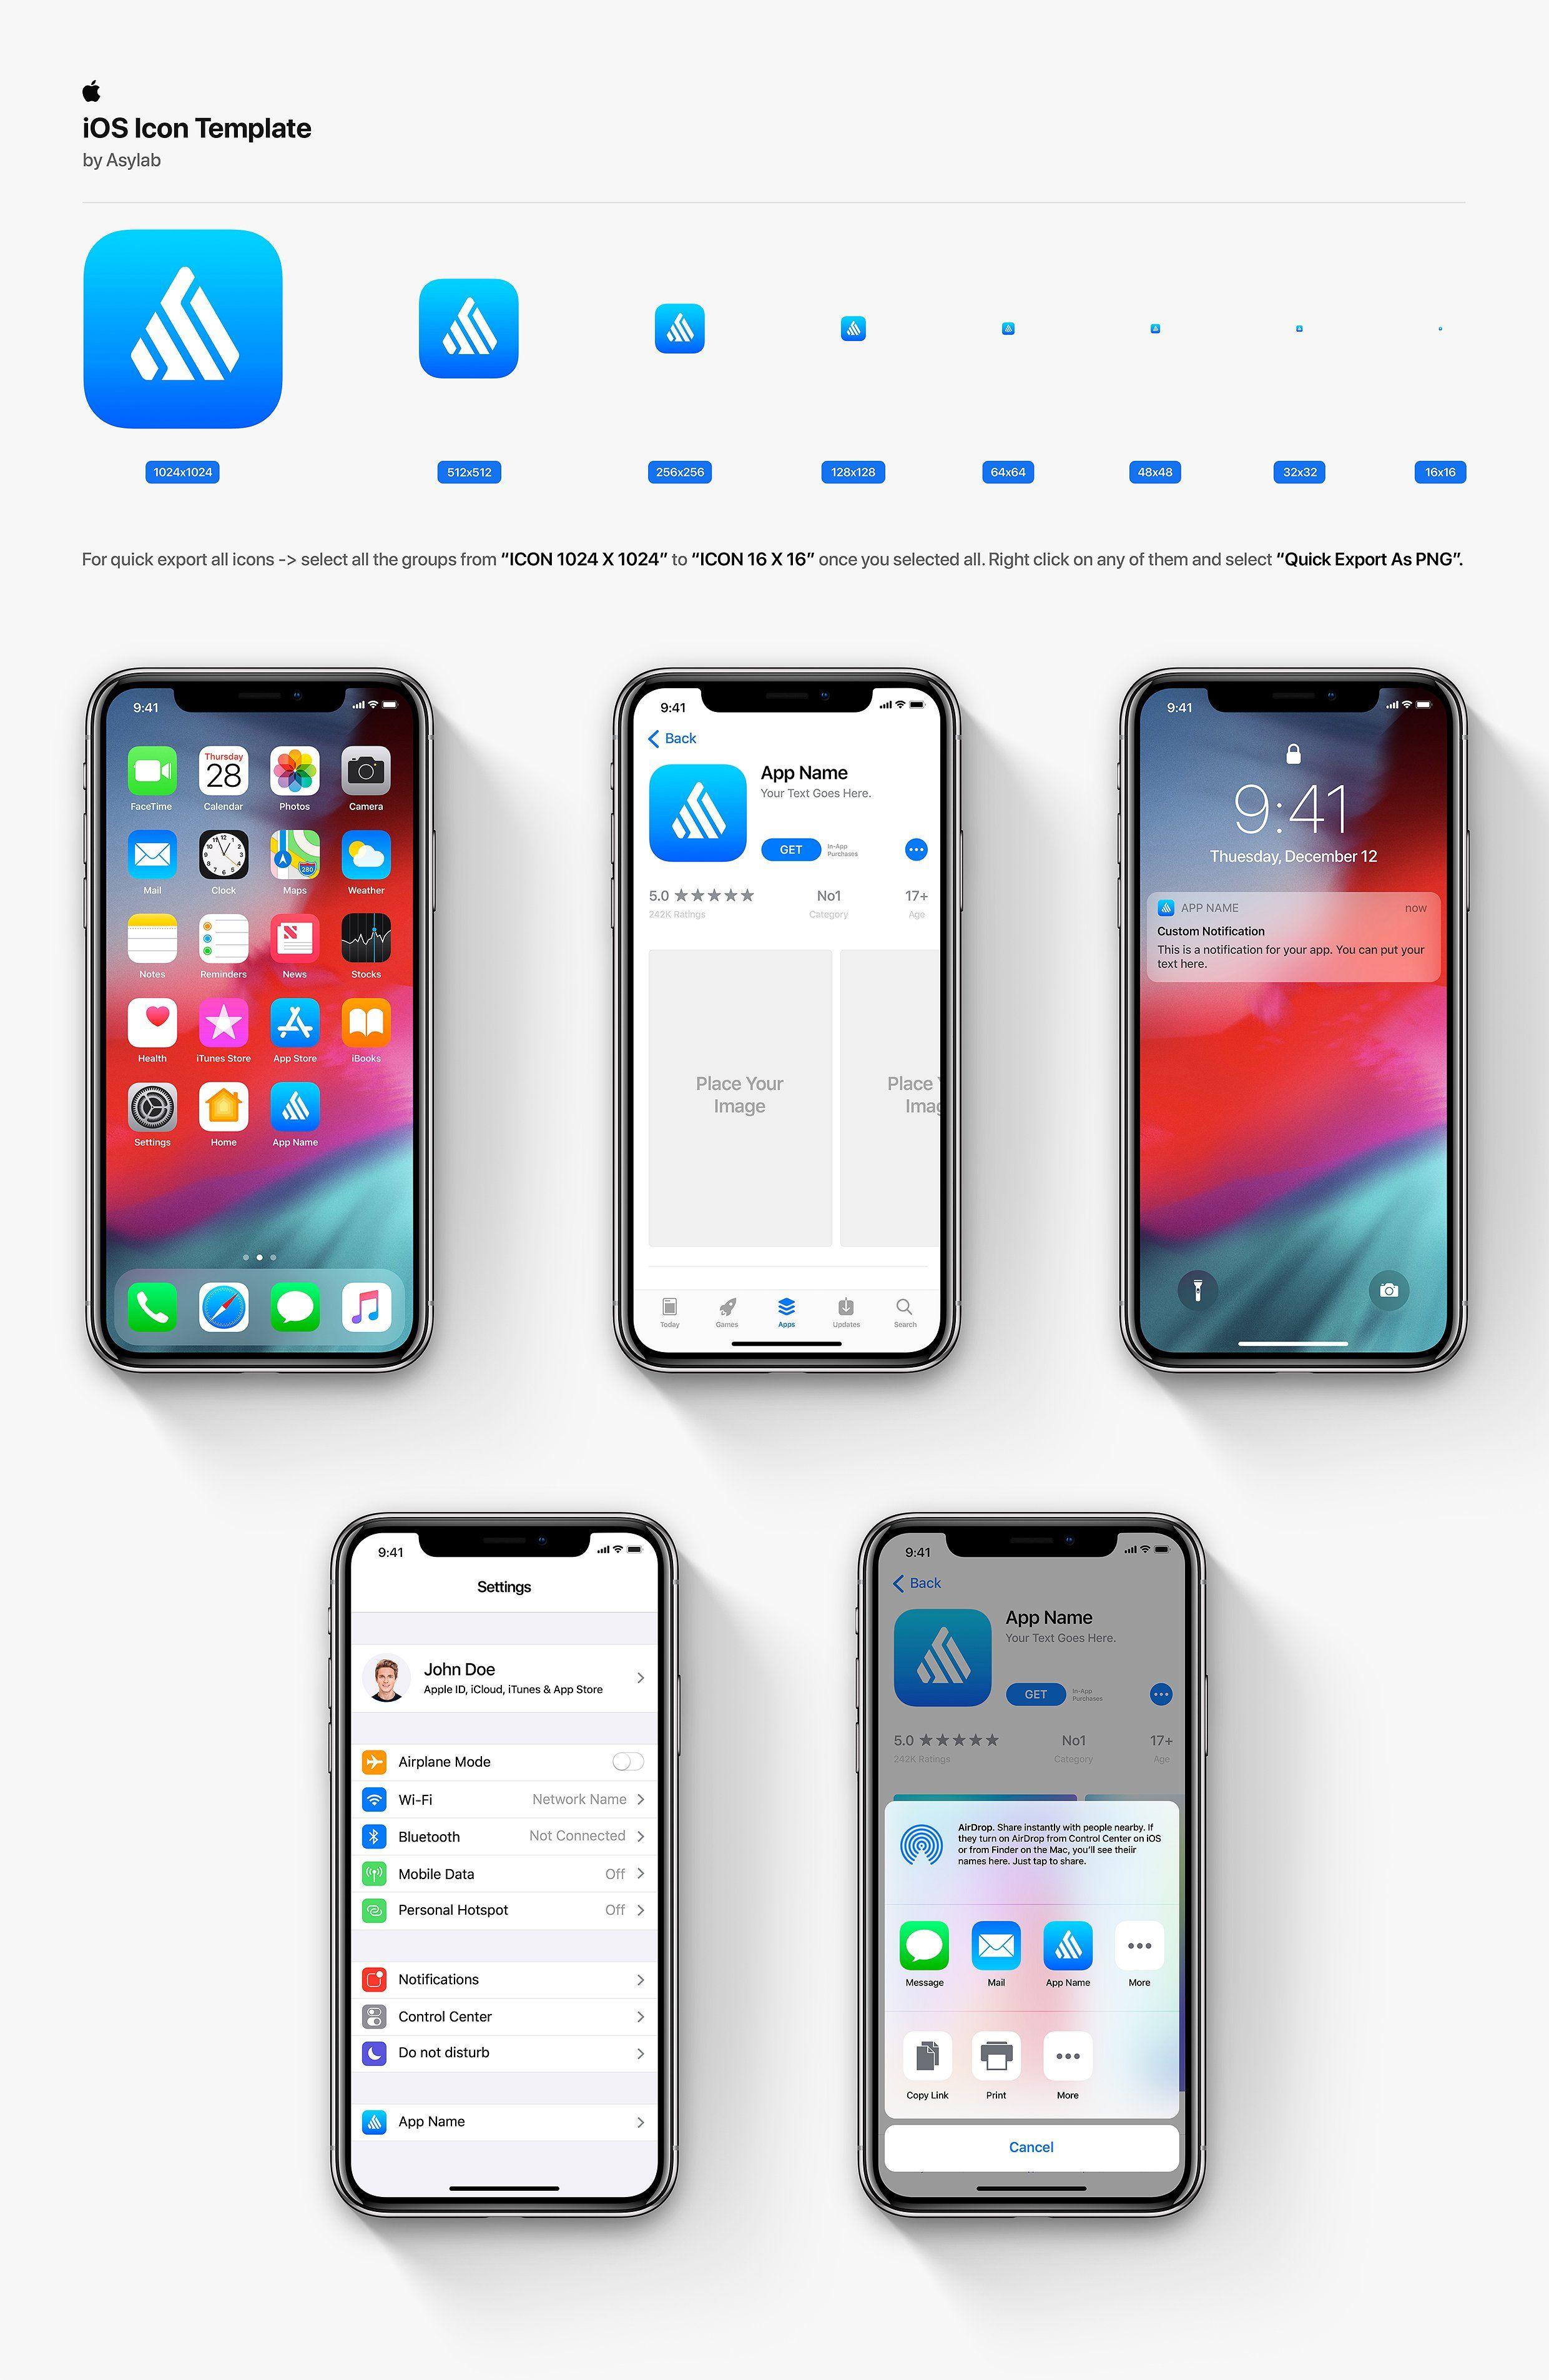 Mobile Os Icon Template Mockup Psd Ios Icon Ios App Icon